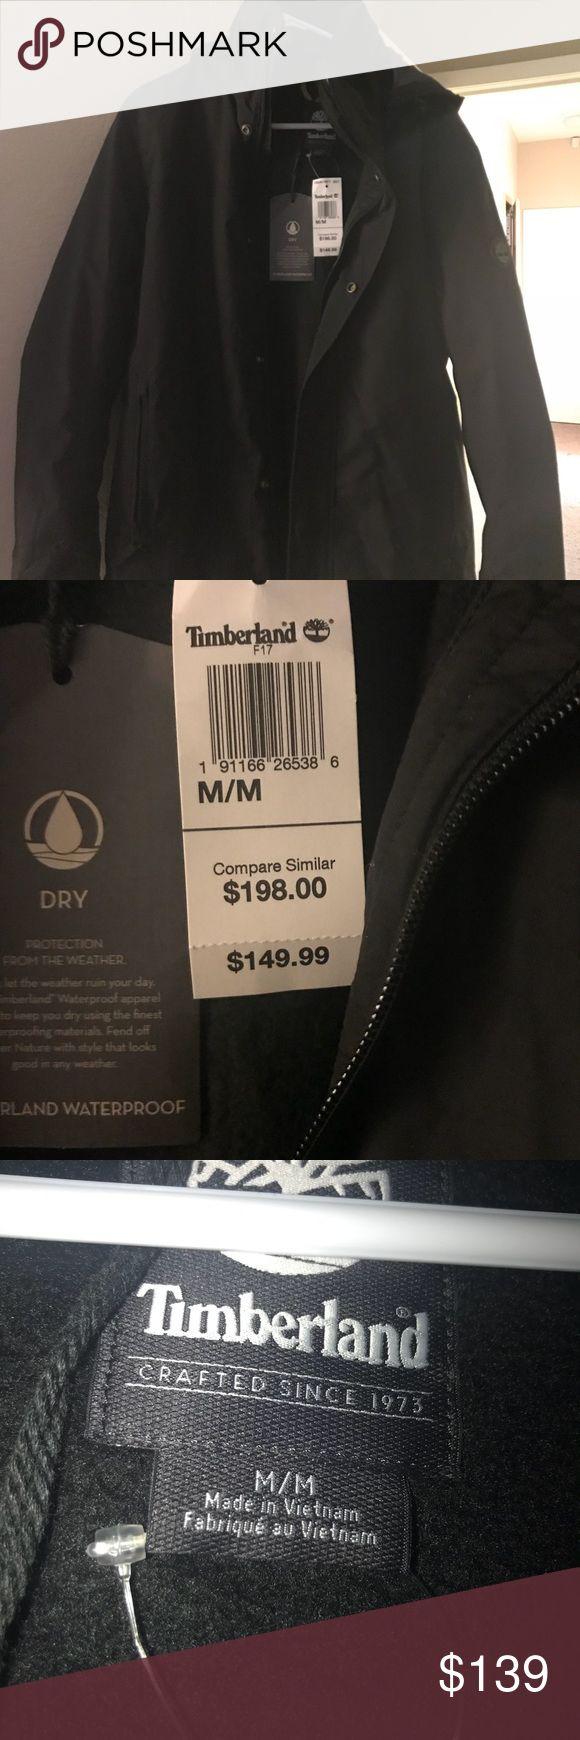 Timberland jacket Brand new timberland jacket new with tags waterproof Timberland Jackets & Coats